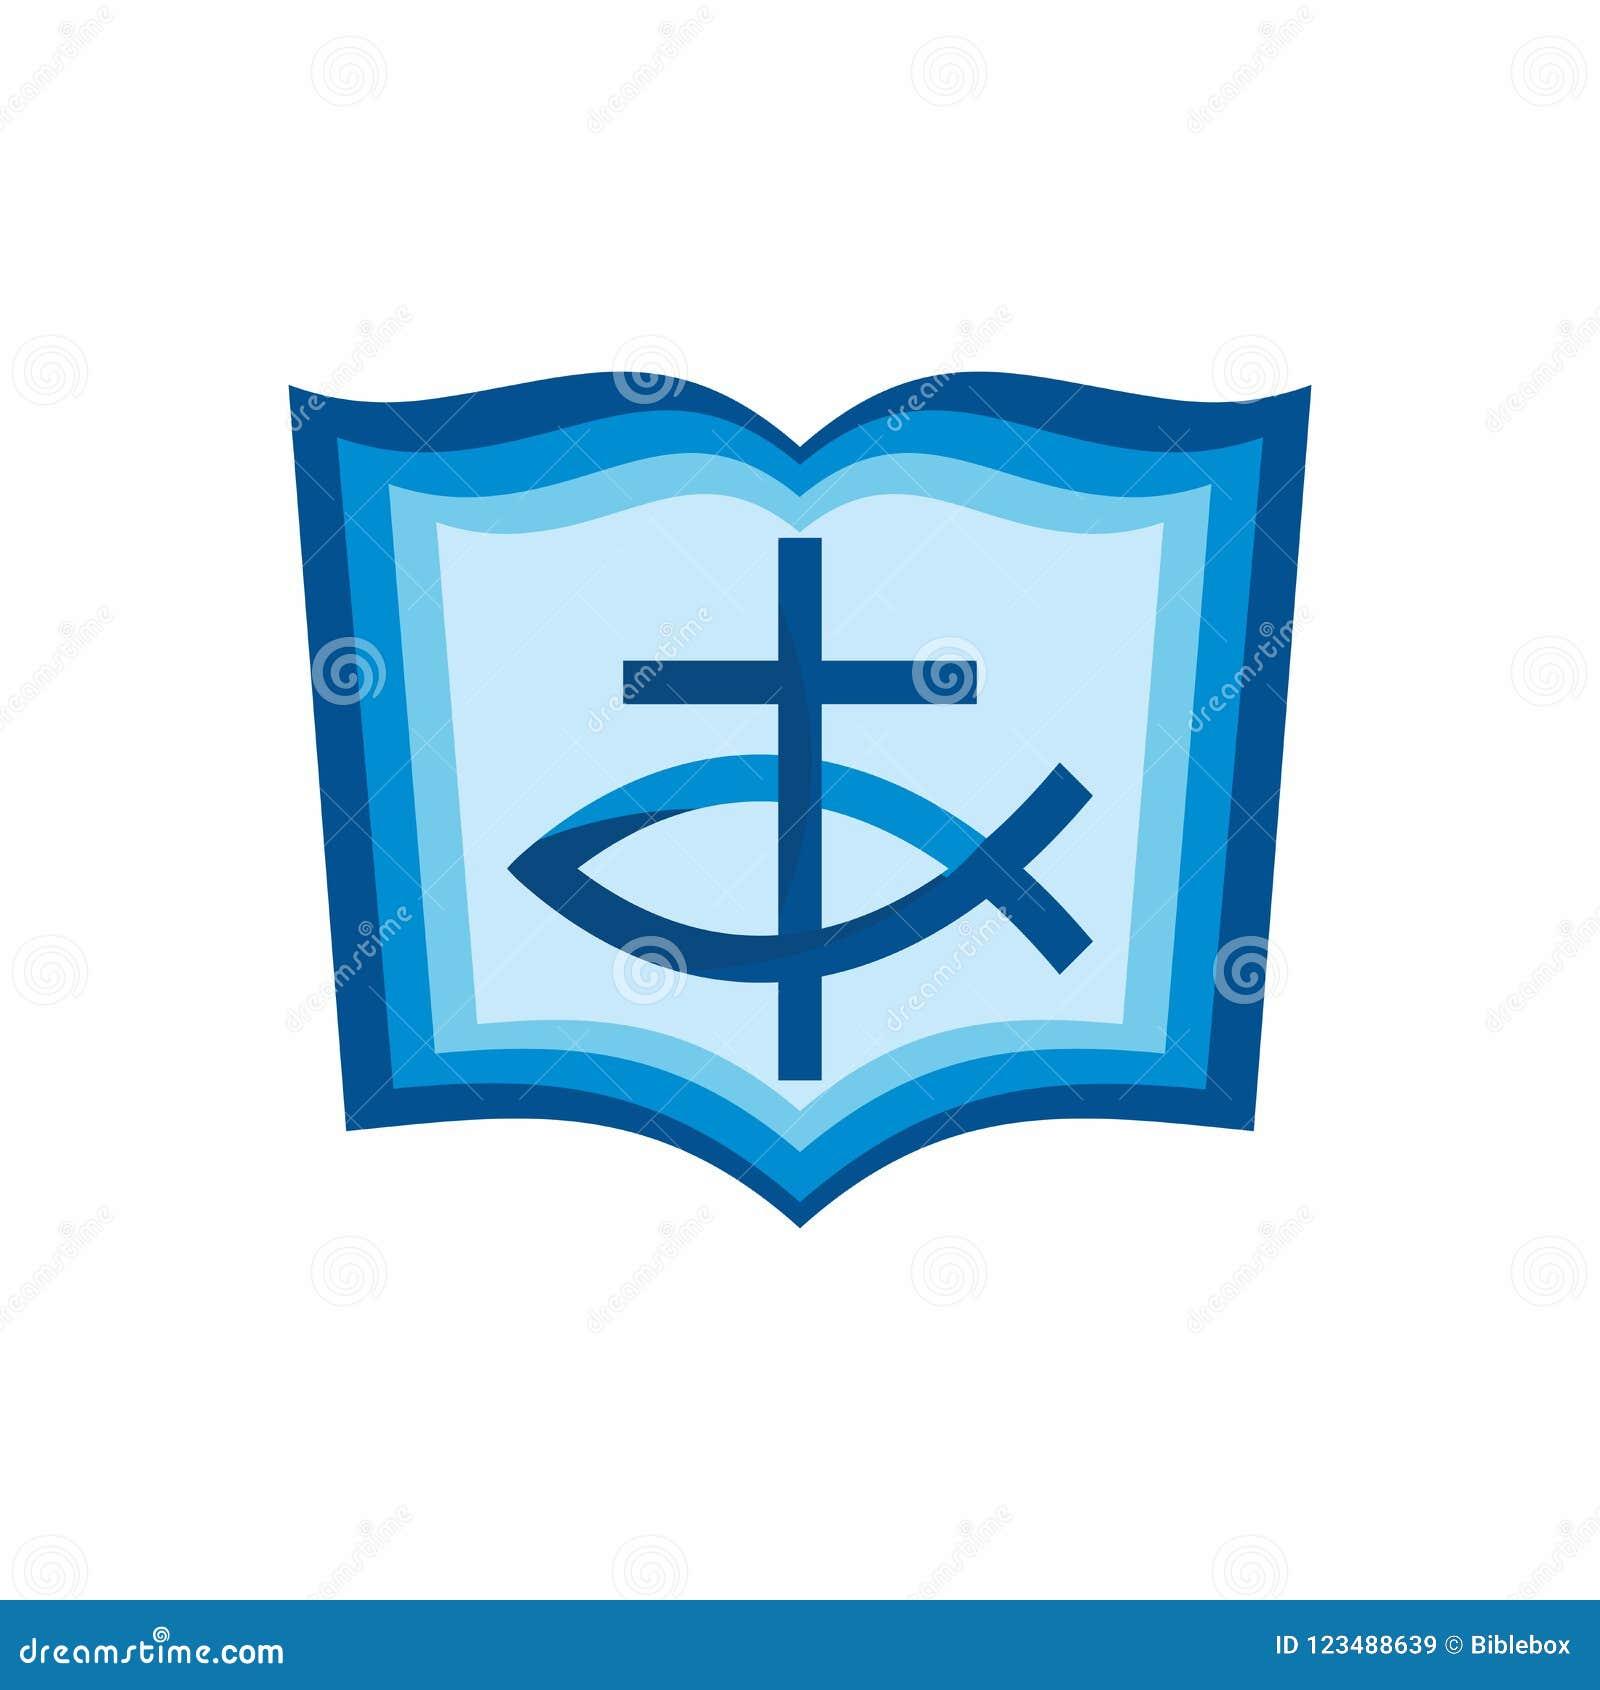 Church Logo Christian Symbols Bible Cross And Jesus Fish Stock